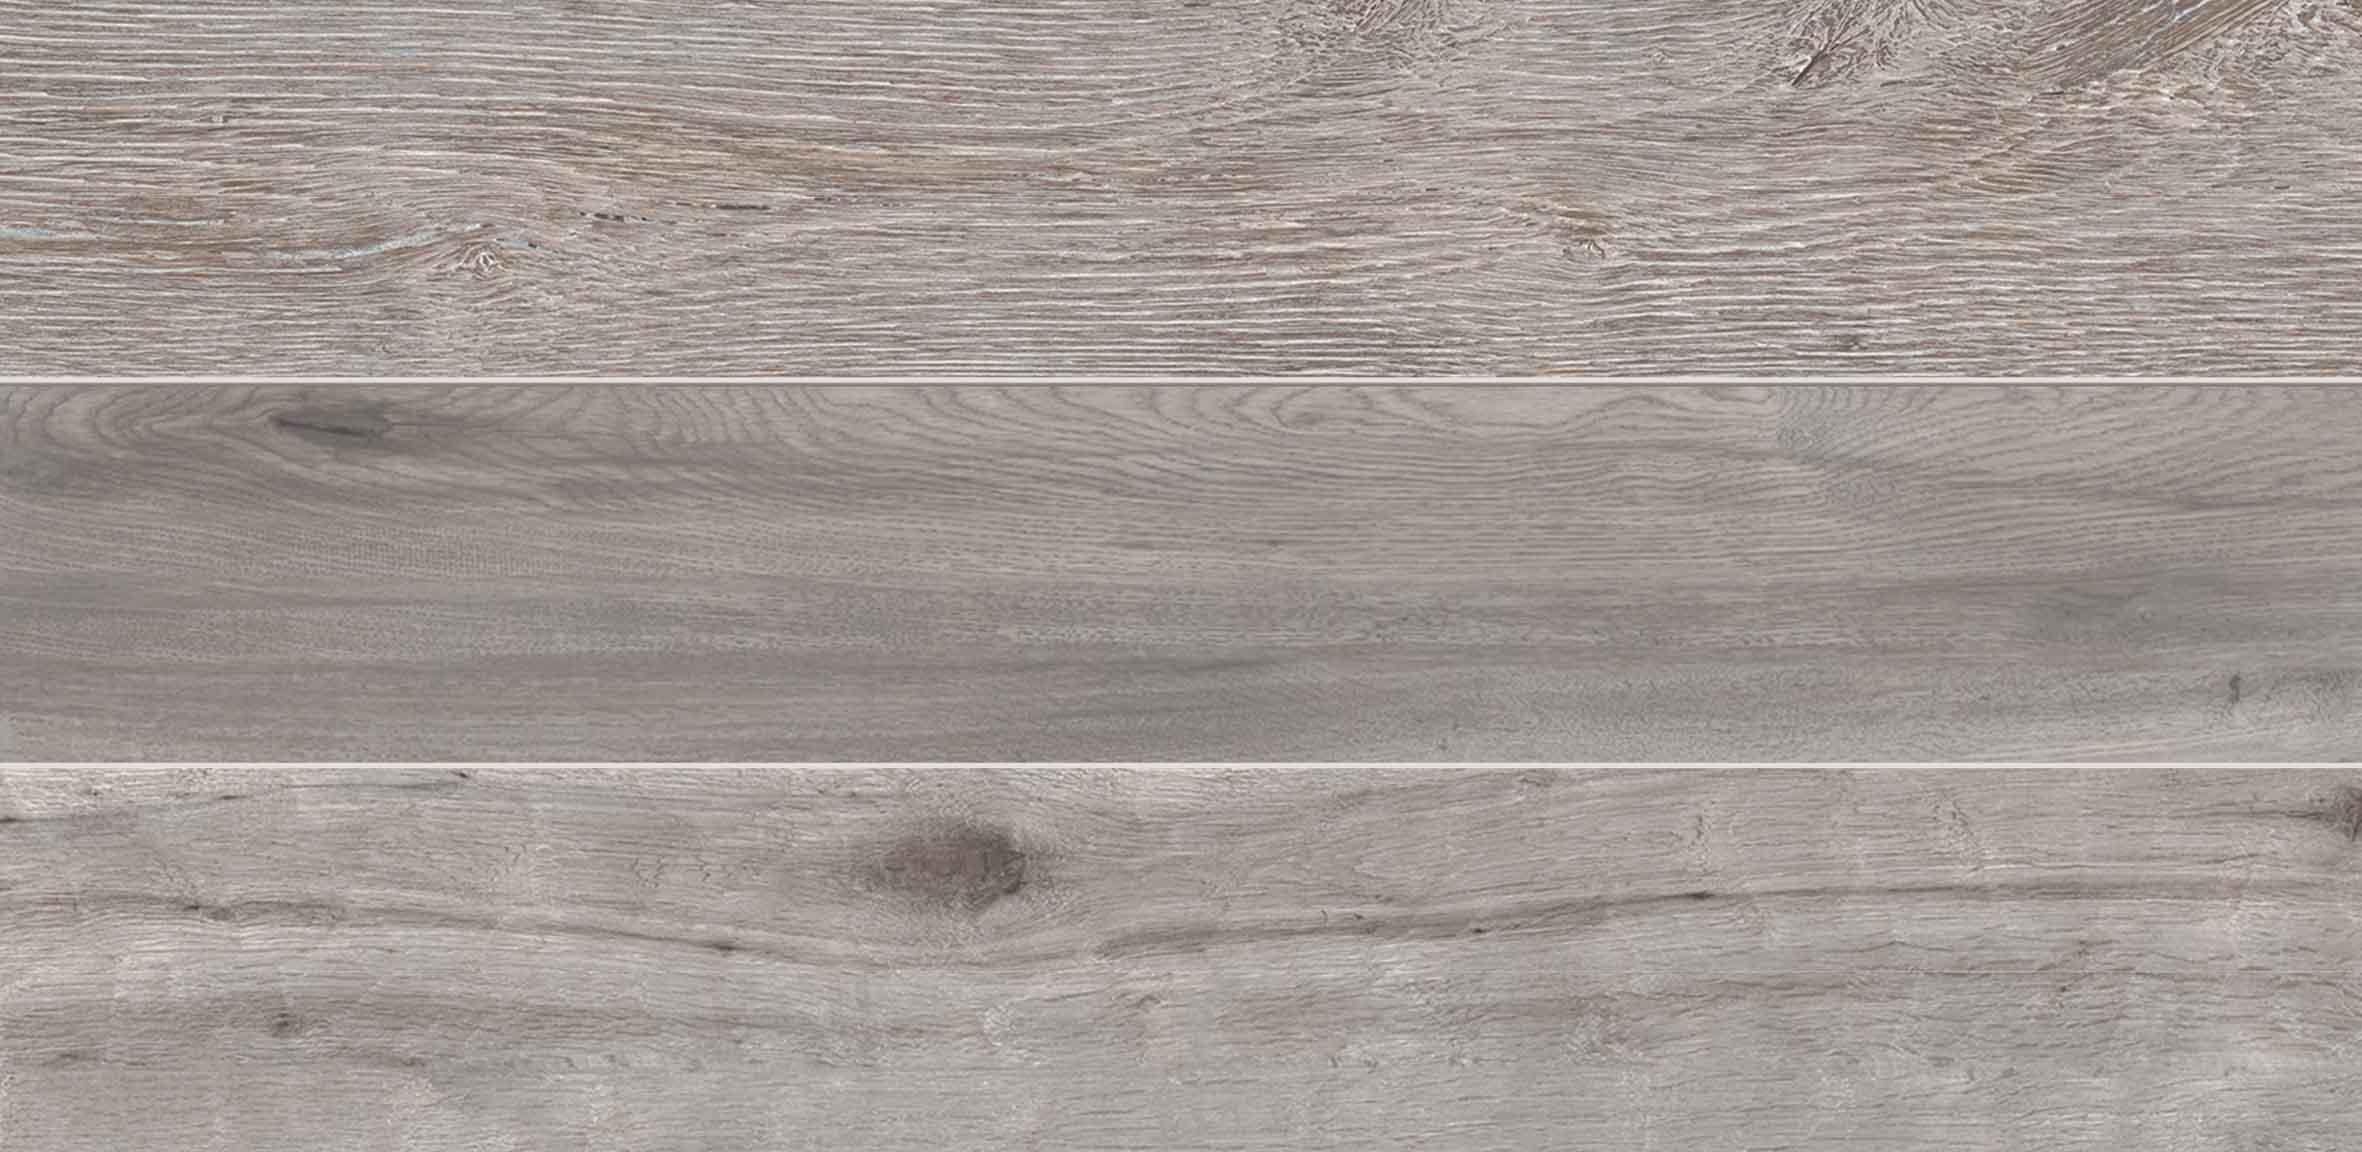 Details Wood Gray Grip 20mm 40 x 80